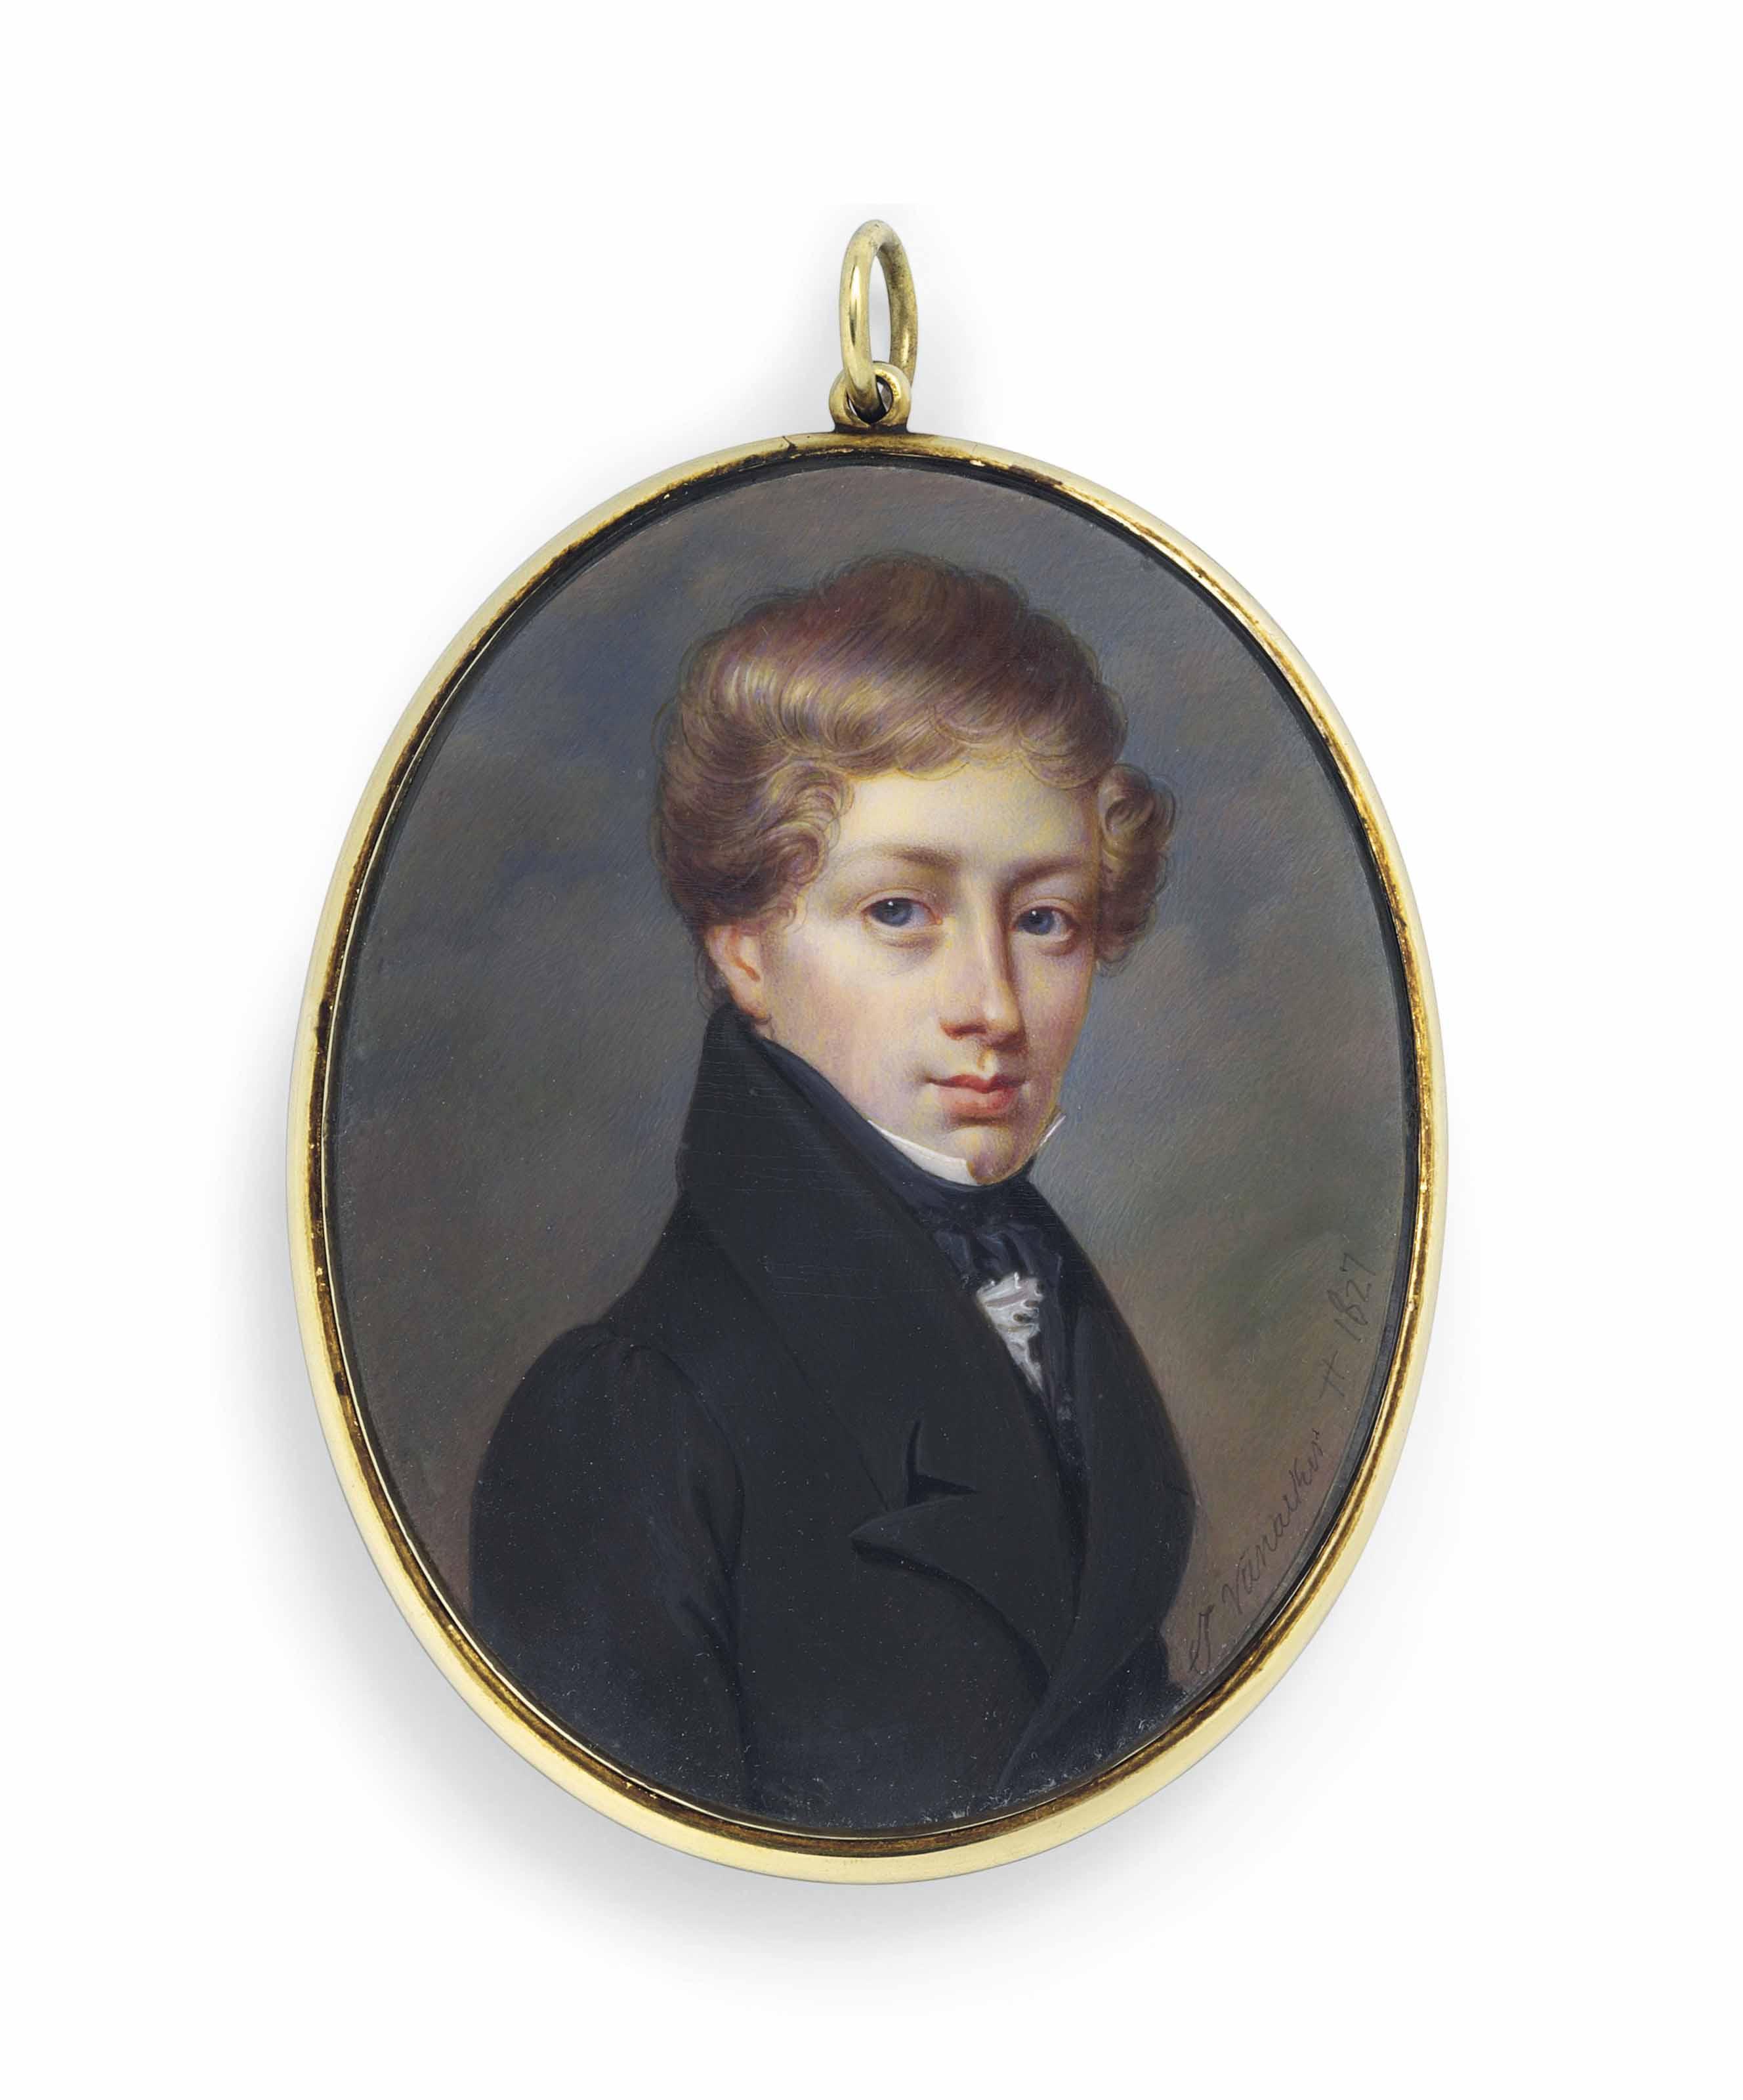 JEAN-BAPTISTE VANACKER (BELGIAN, 1794-1863)